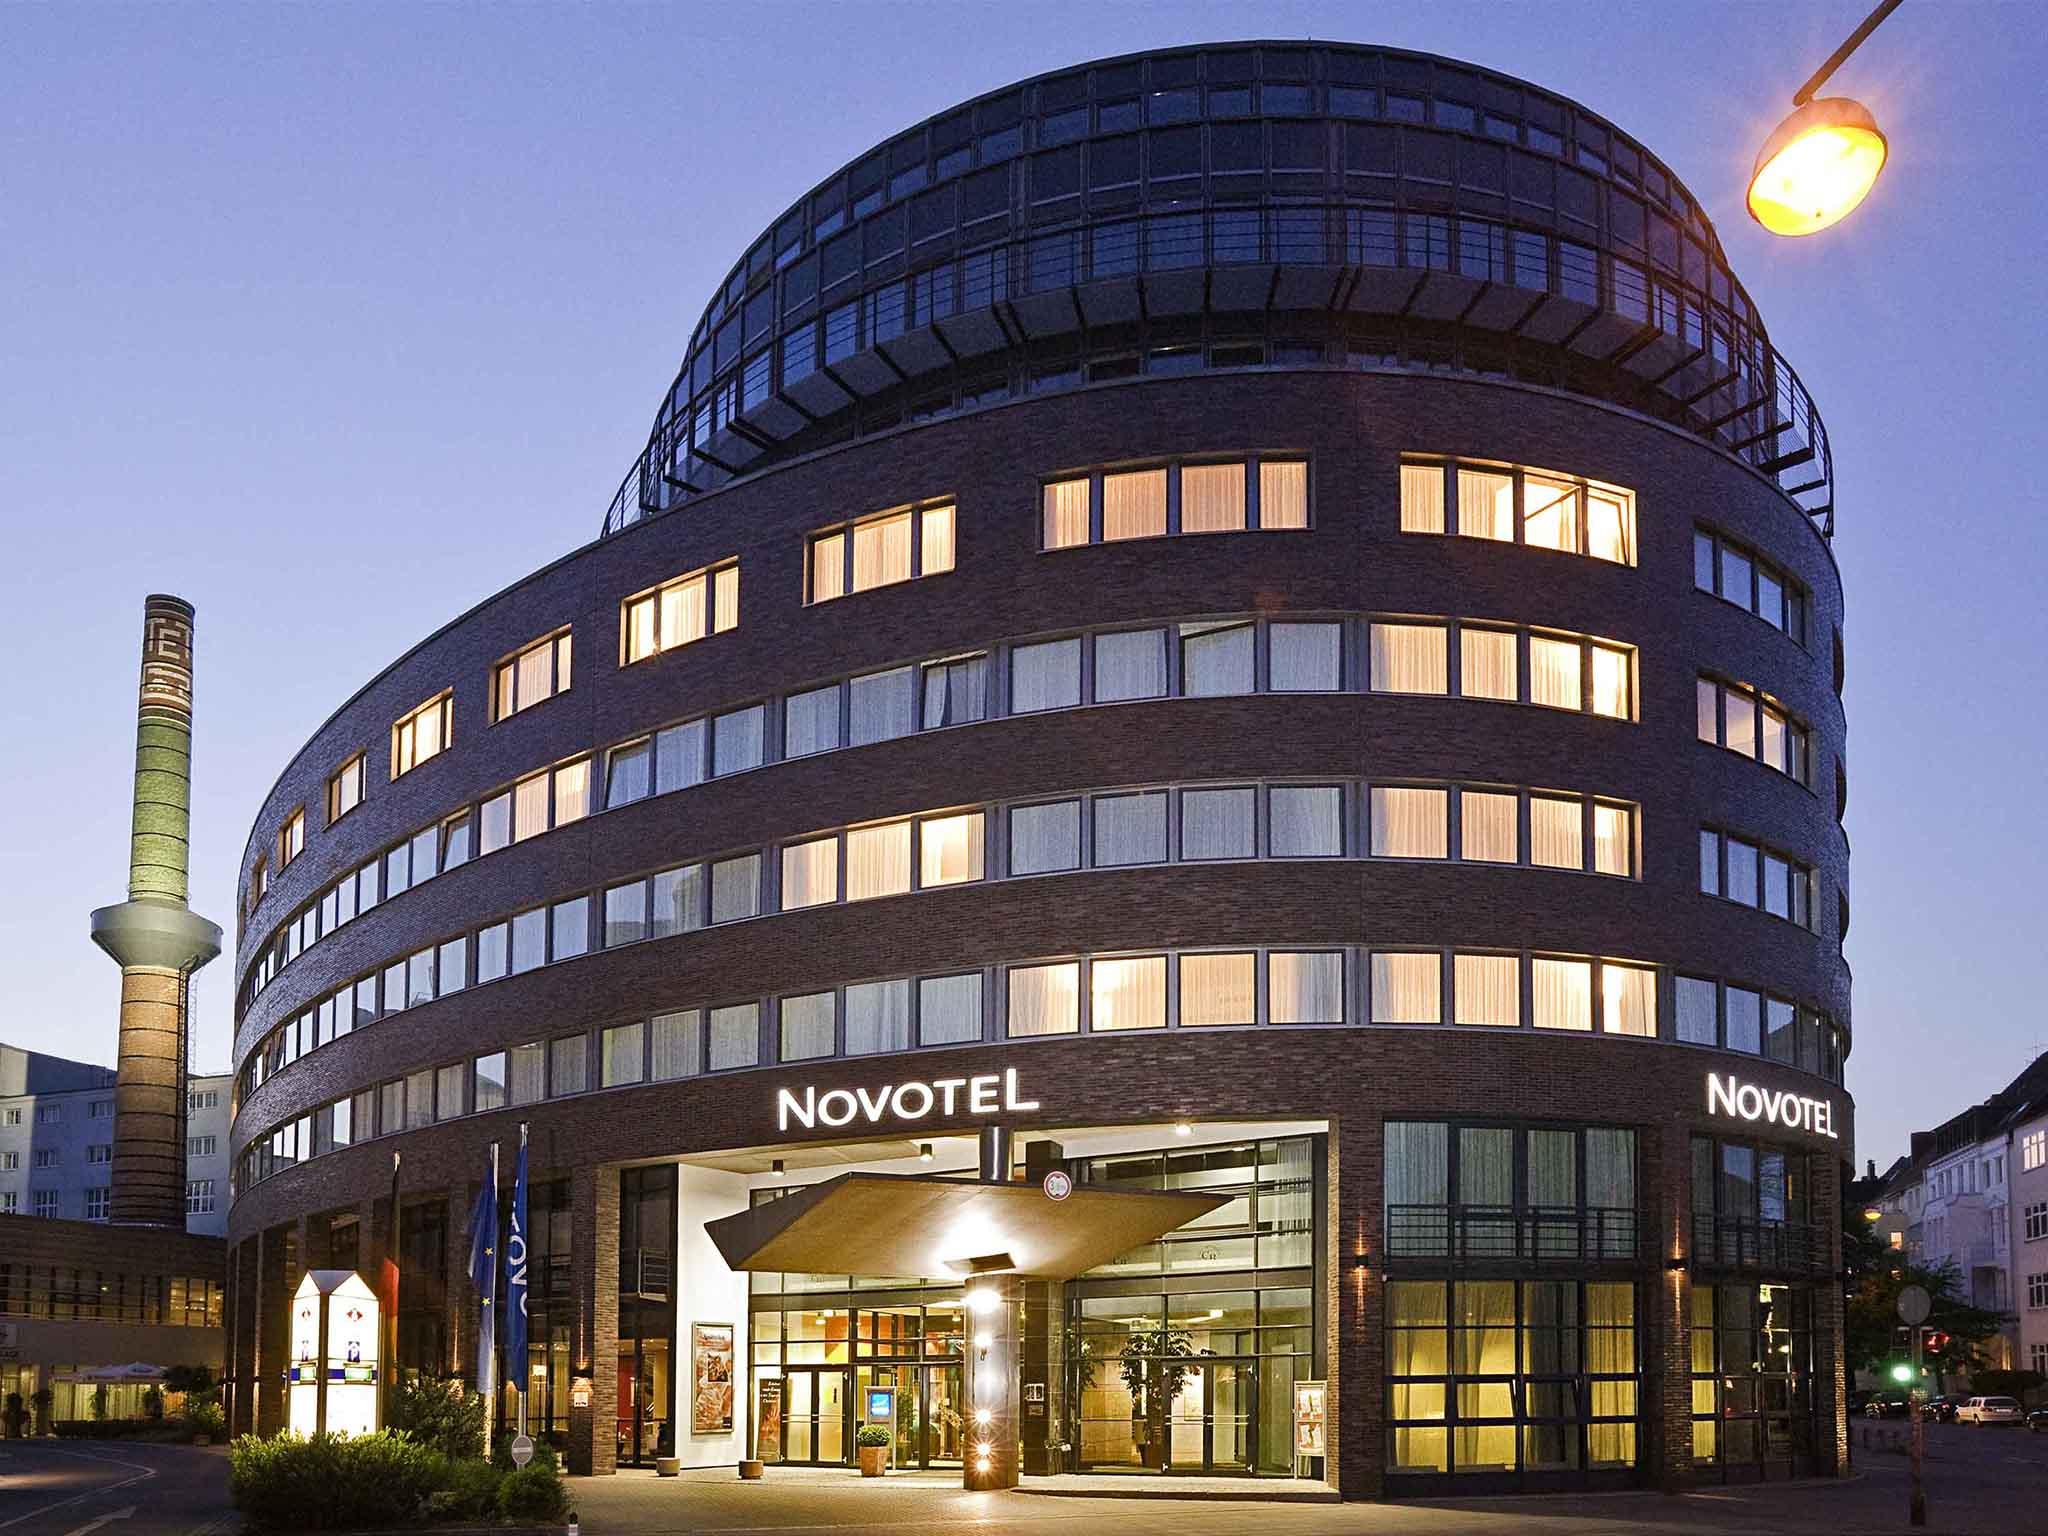 Hotel Novotel Hannover